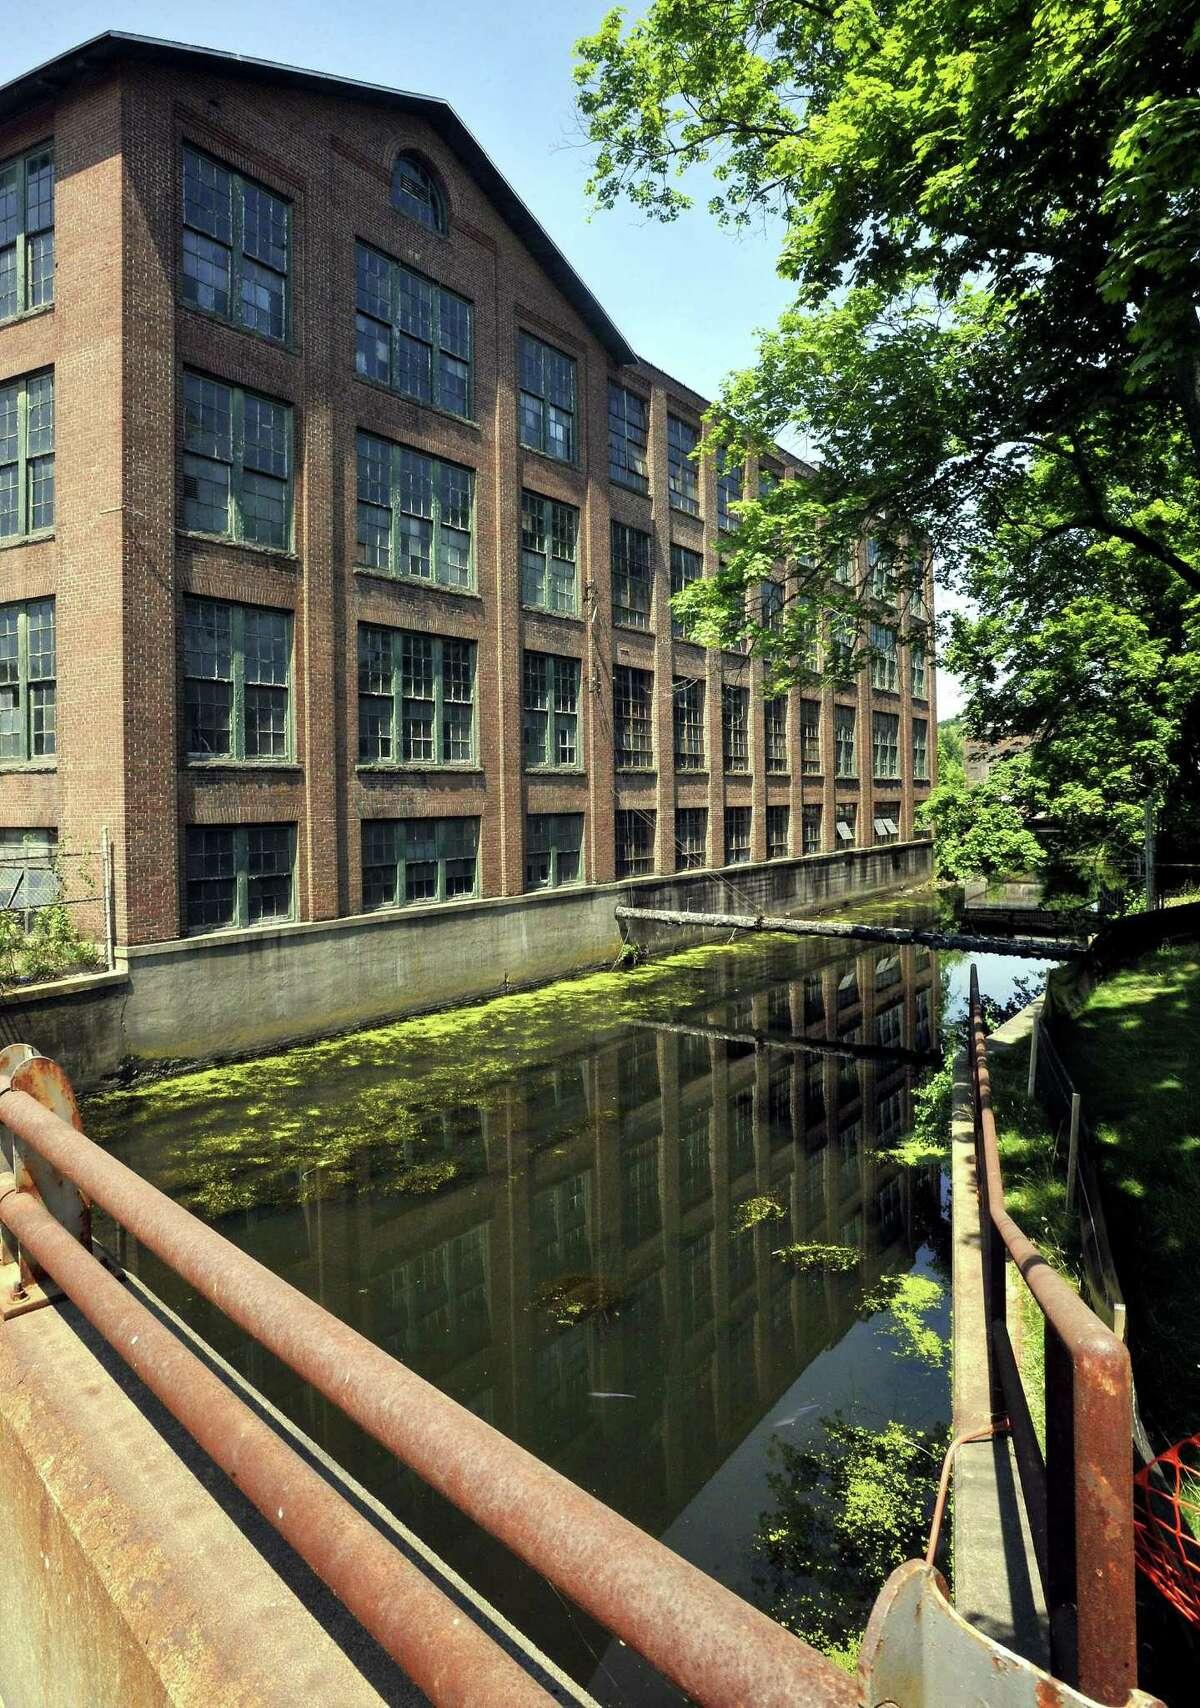 The former Gilbert & Bennett wire mill in Georgetown, Conn., Thursday, July 12, 2012.